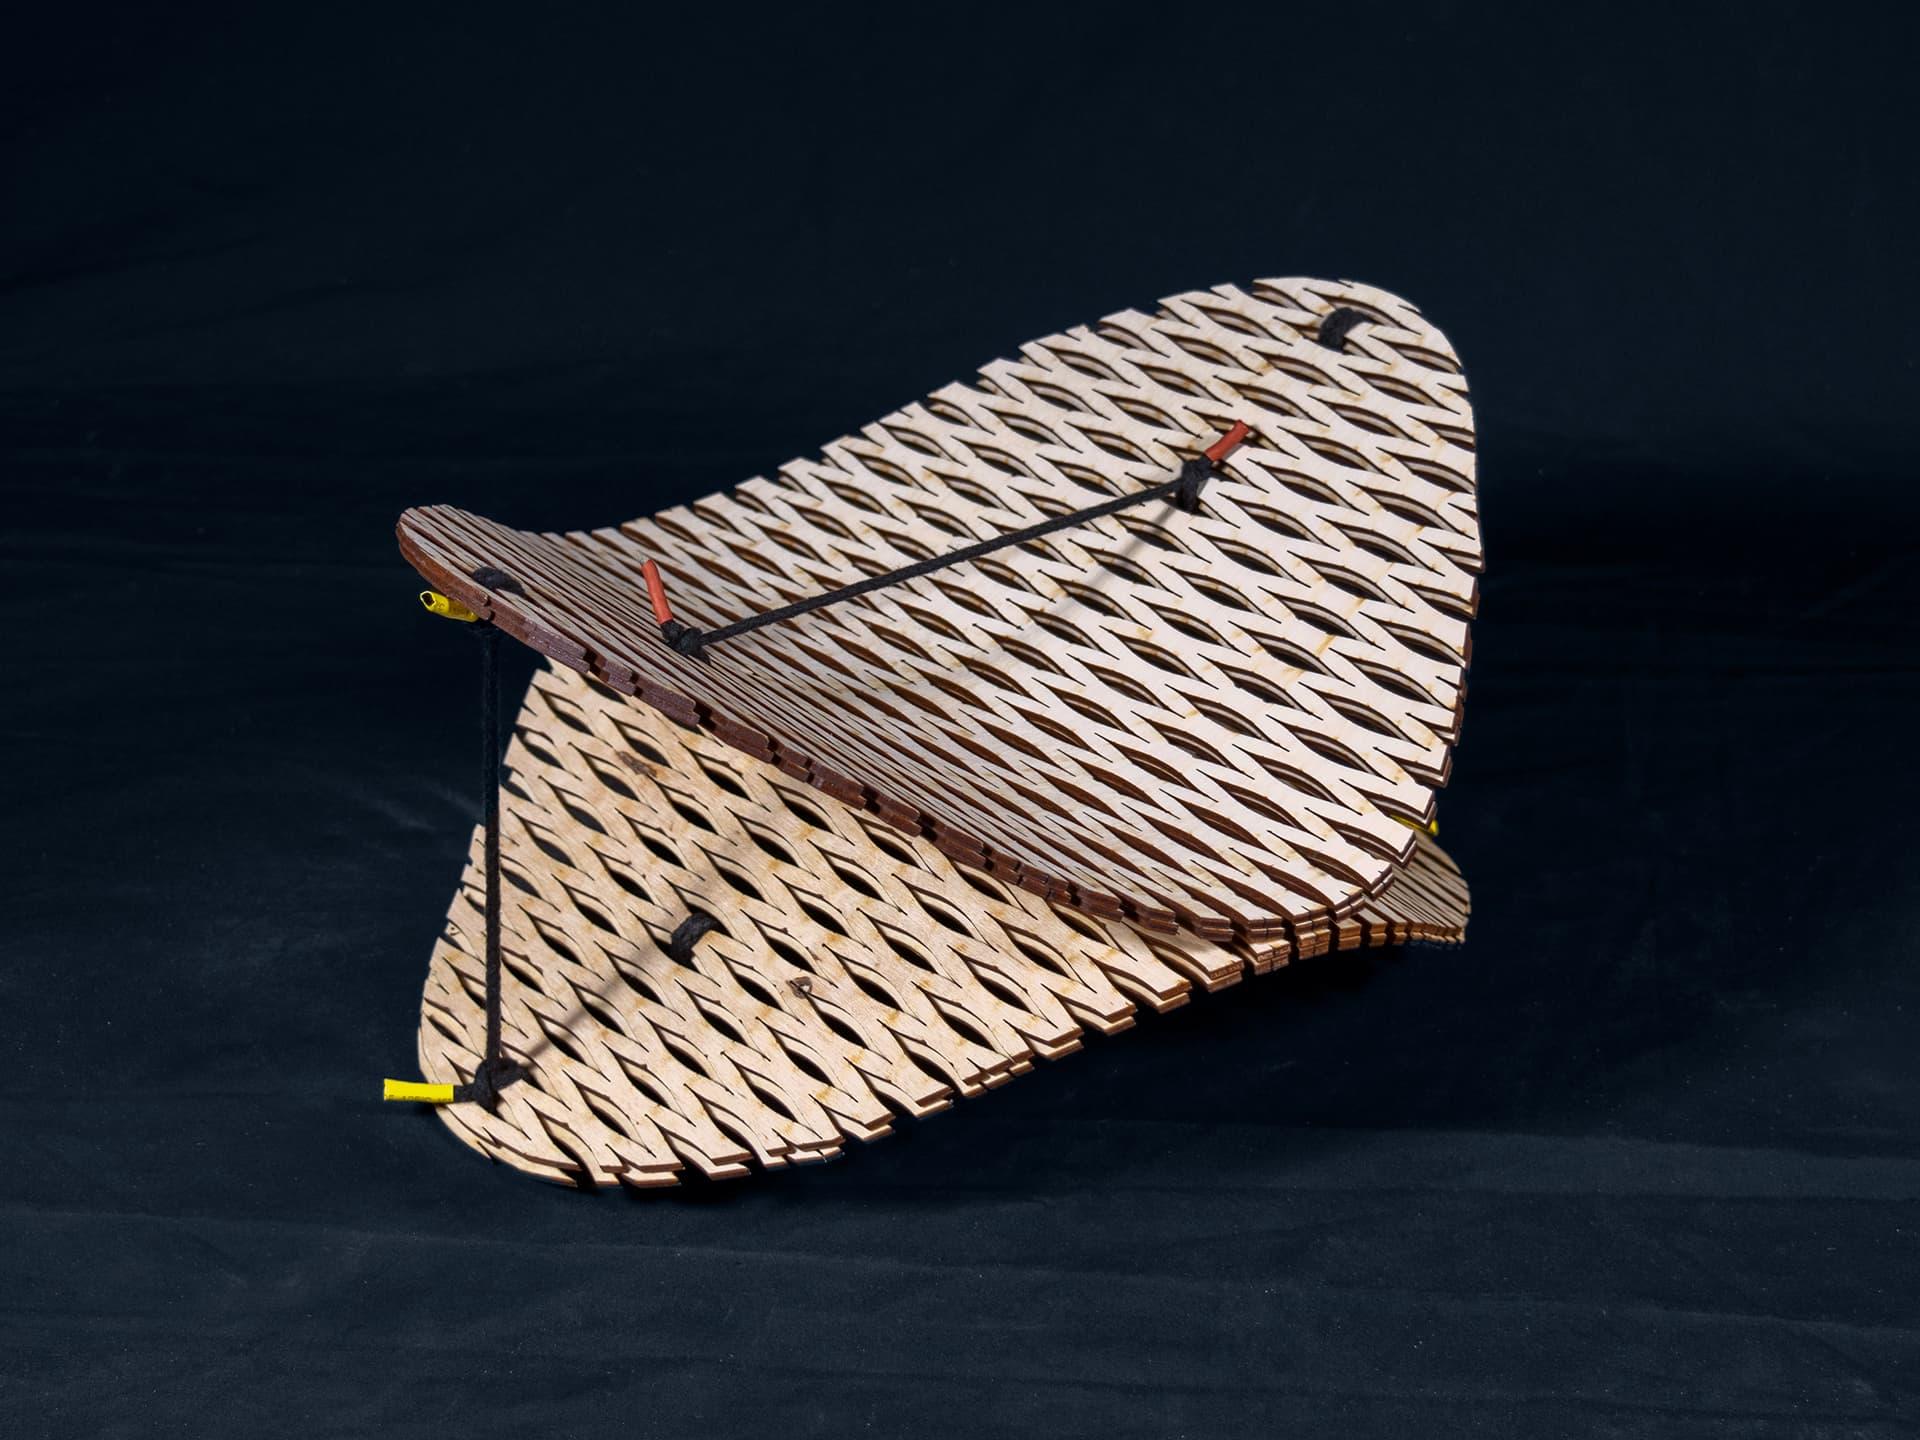 Kerfed Wood Sculpture